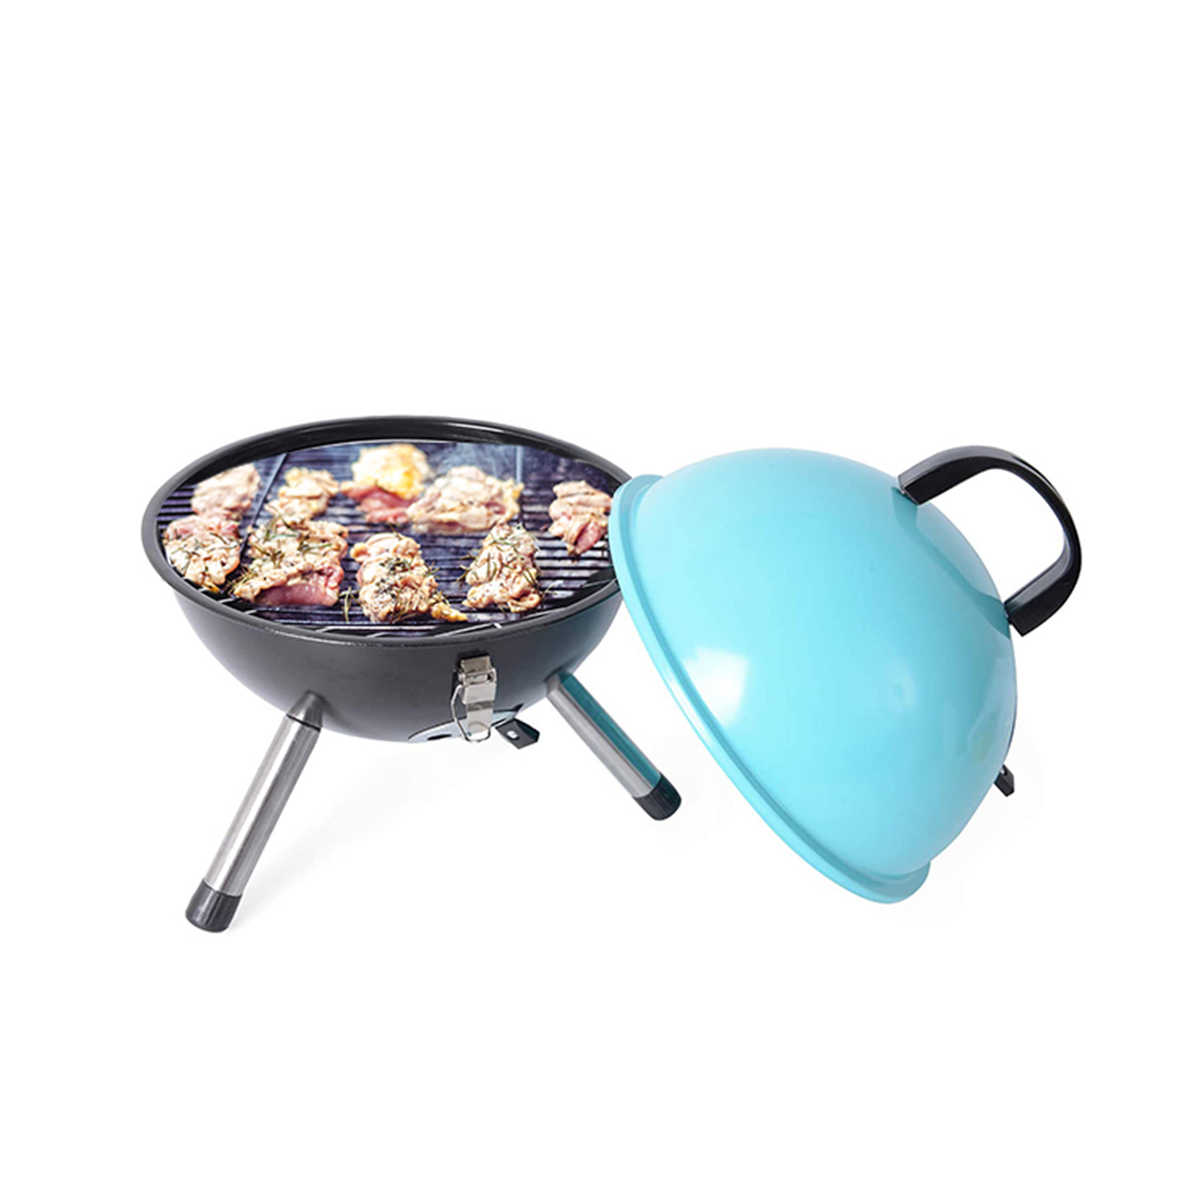 thumbnail 23 - Outdoor Backyard Cooking Mini Portable Charcoal BBQ Grill Bottom Storage